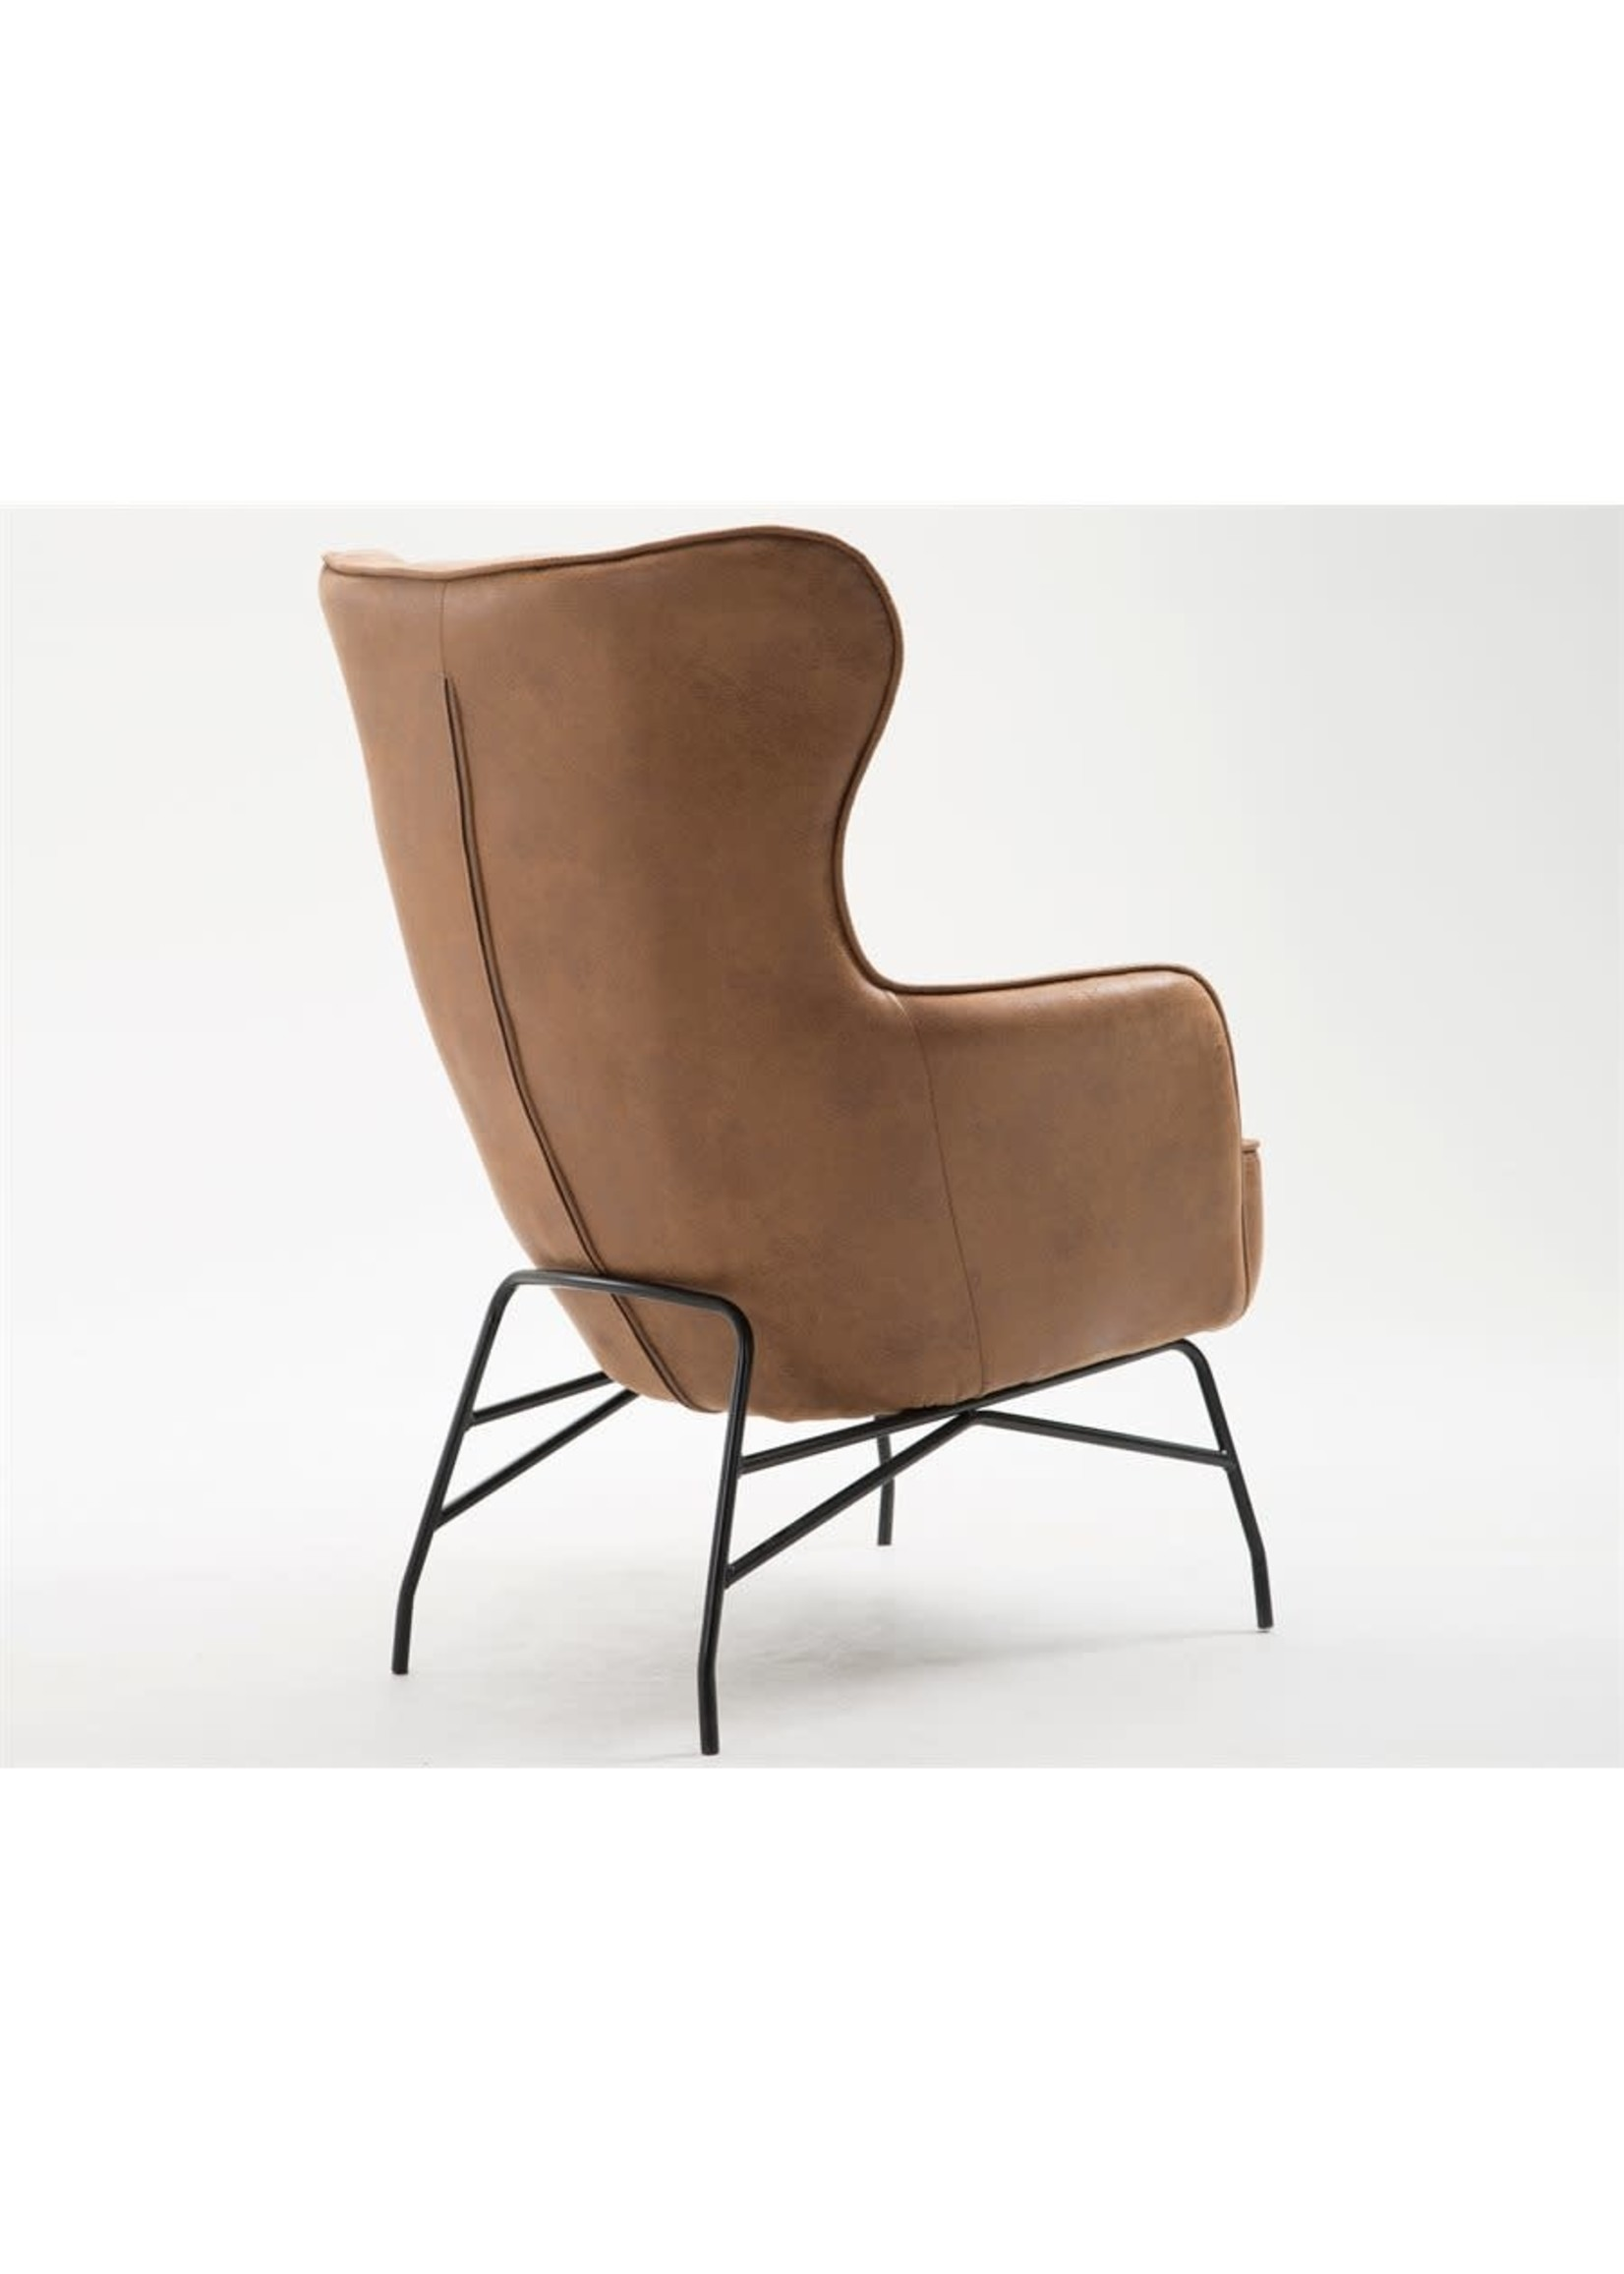 New Franky Chair Badlands Saddle (EH U3327-05-05)